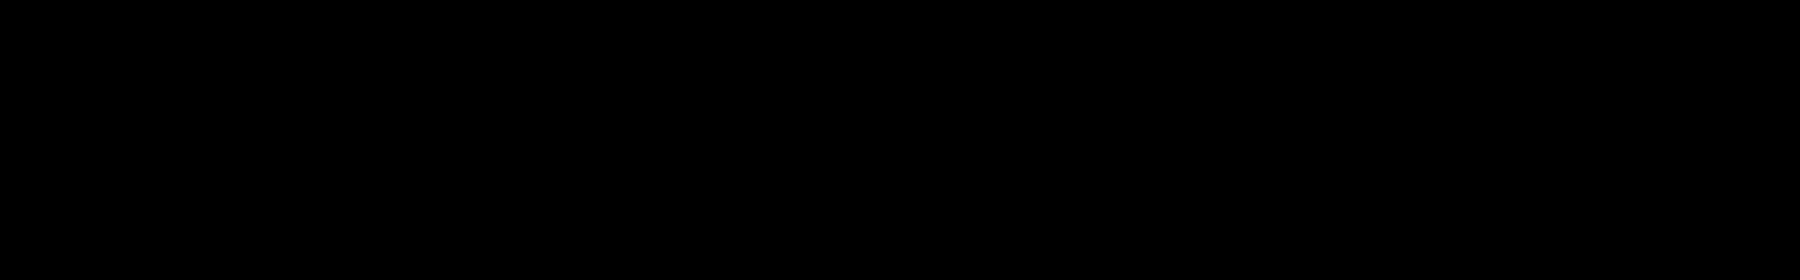 Neo Electronica - Serum Wave Presets audio waveform